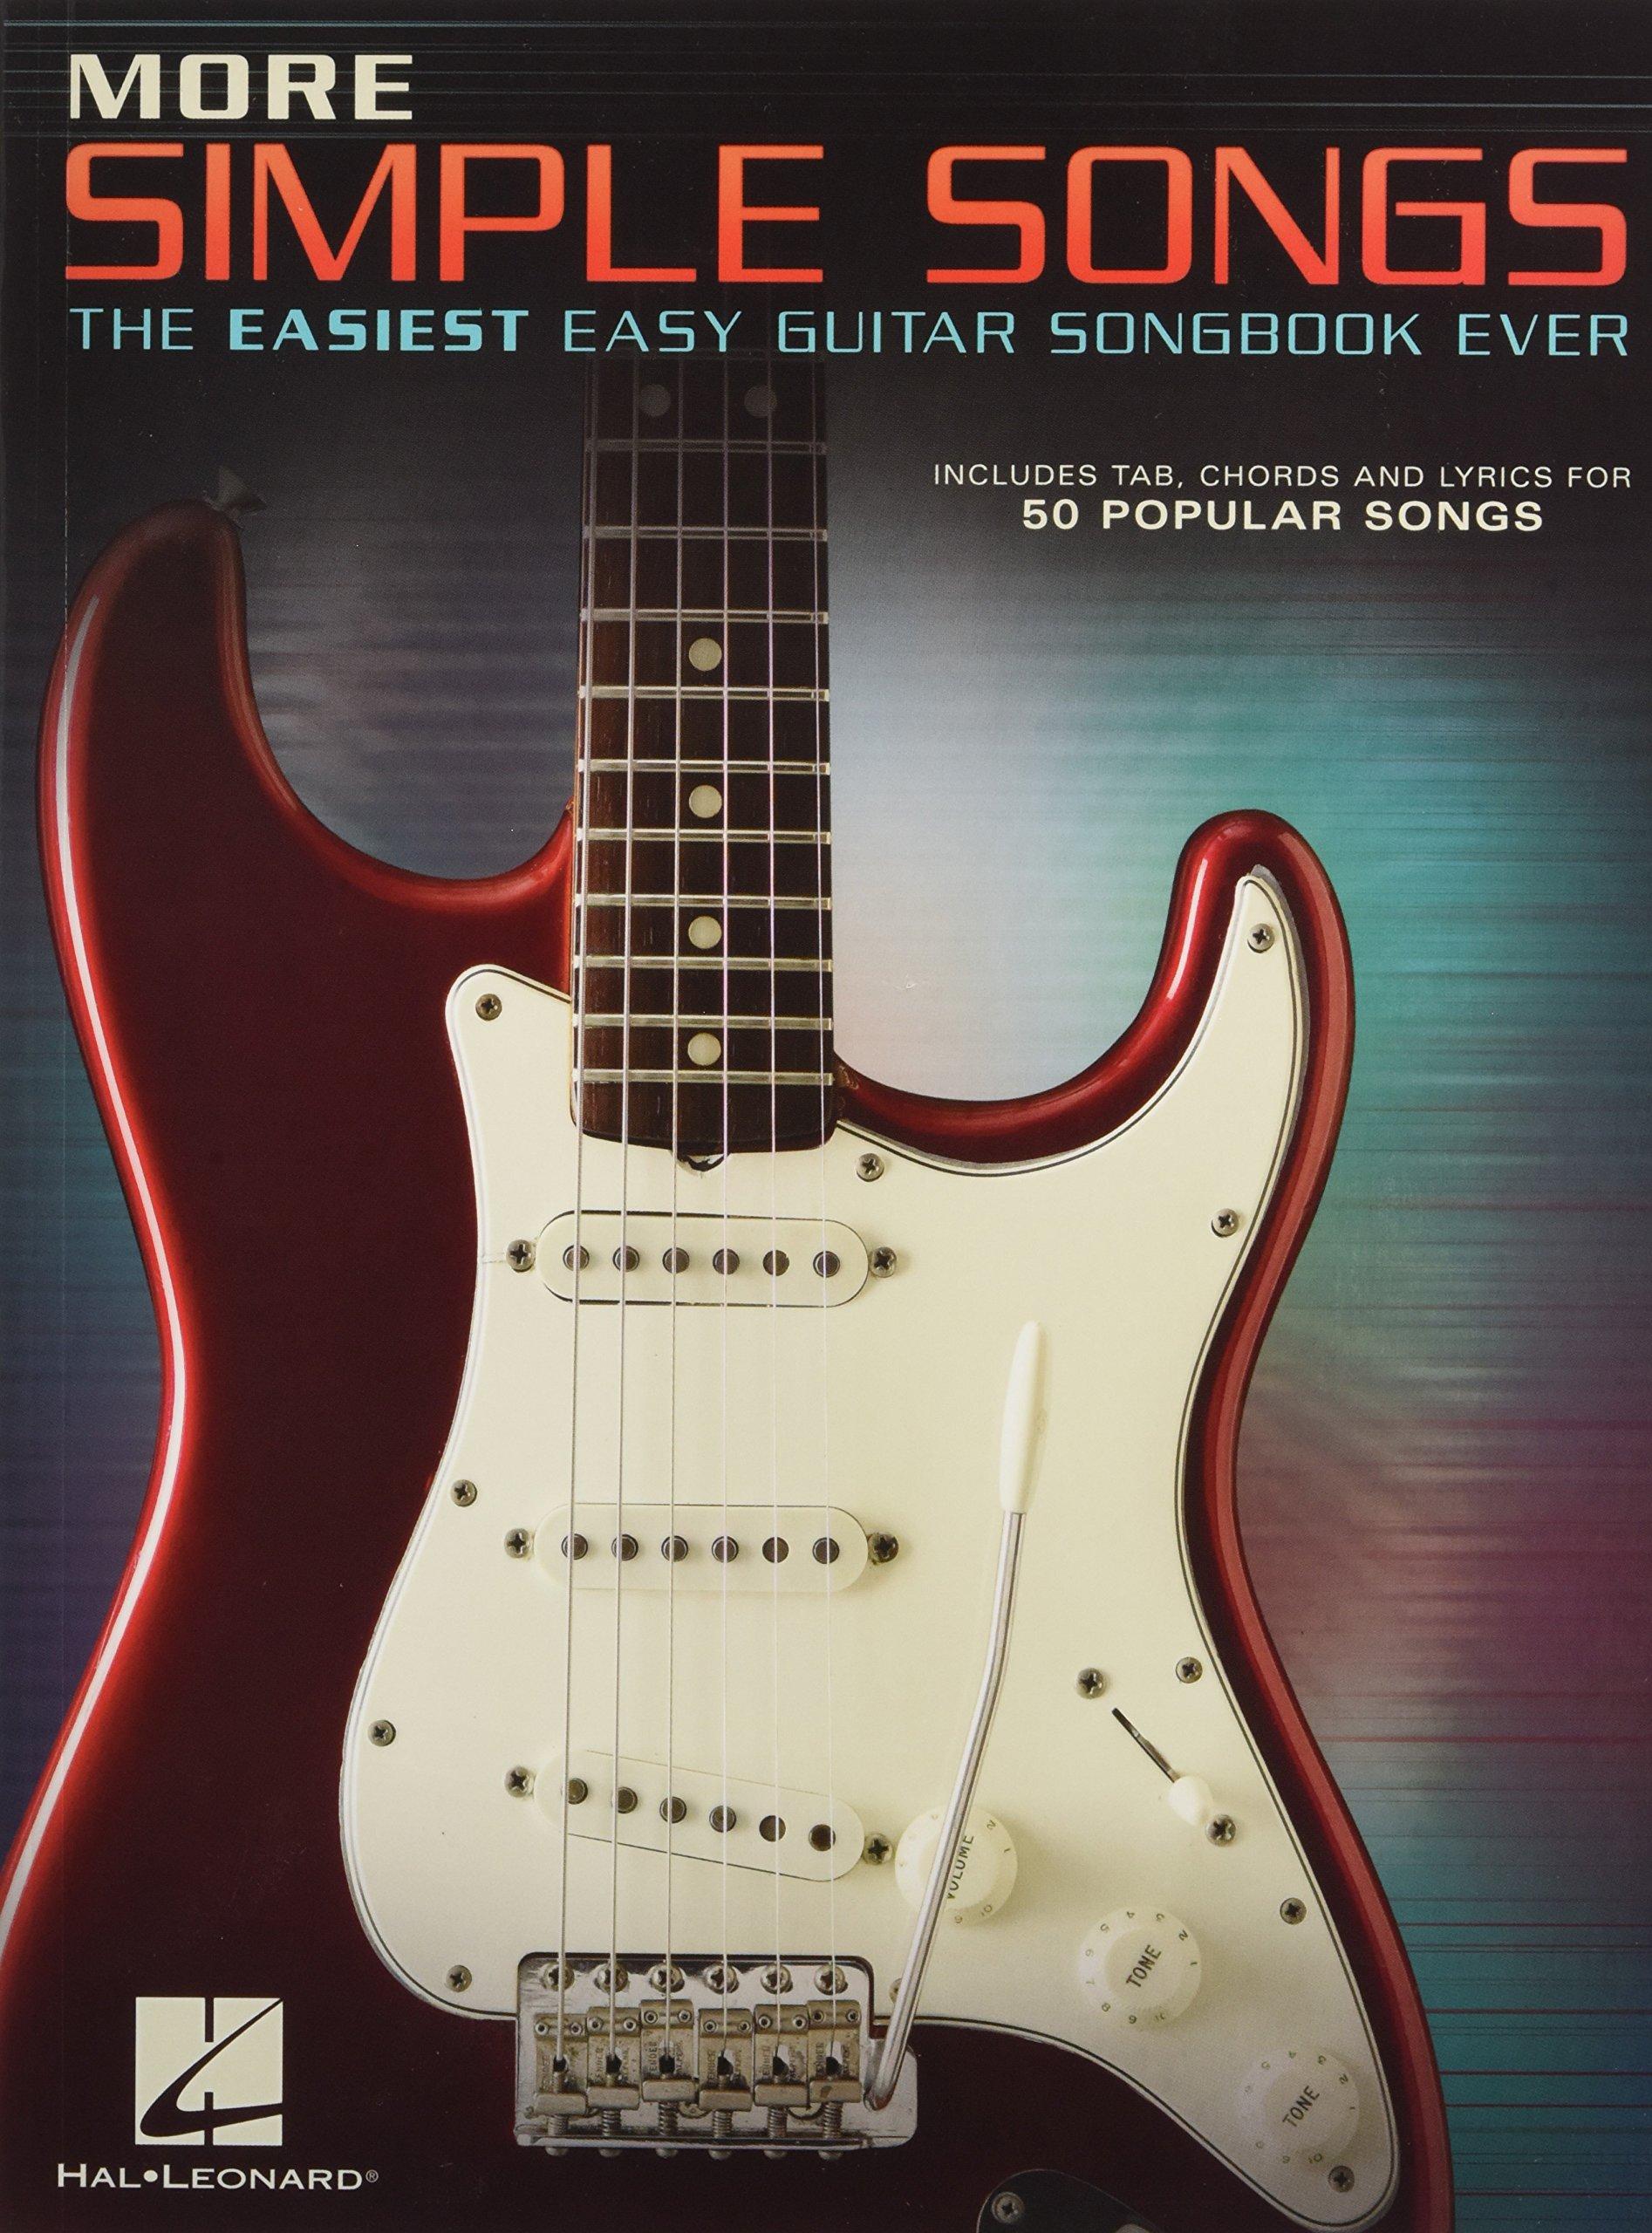 More Simple Songs The Easiest Easy Guitar Songbook Ever Hal